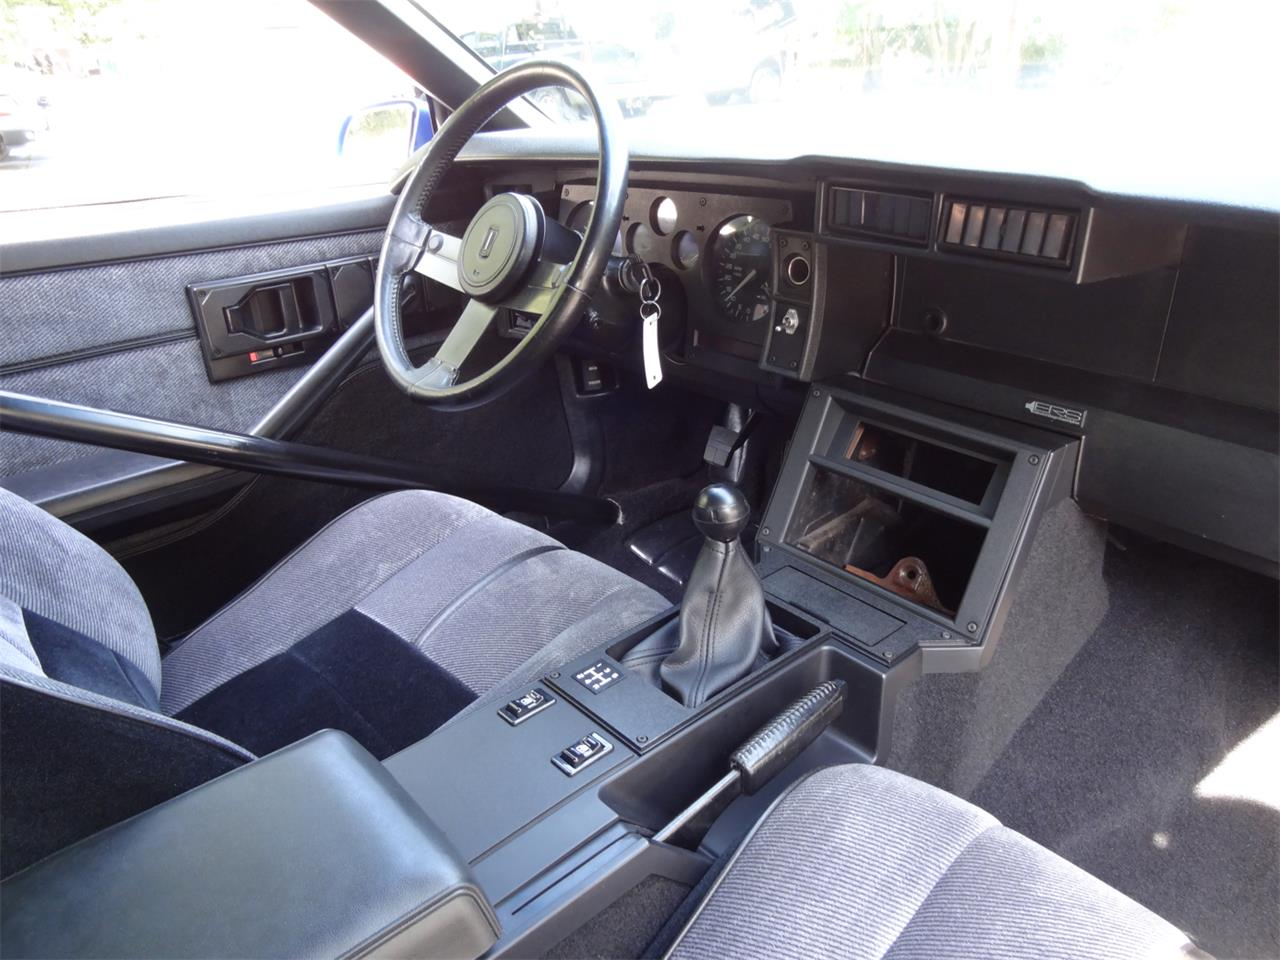 Large Picture of 1983 Chevrolet Camaro IROC Z28 located in Hingham Massachusetts - QUEA